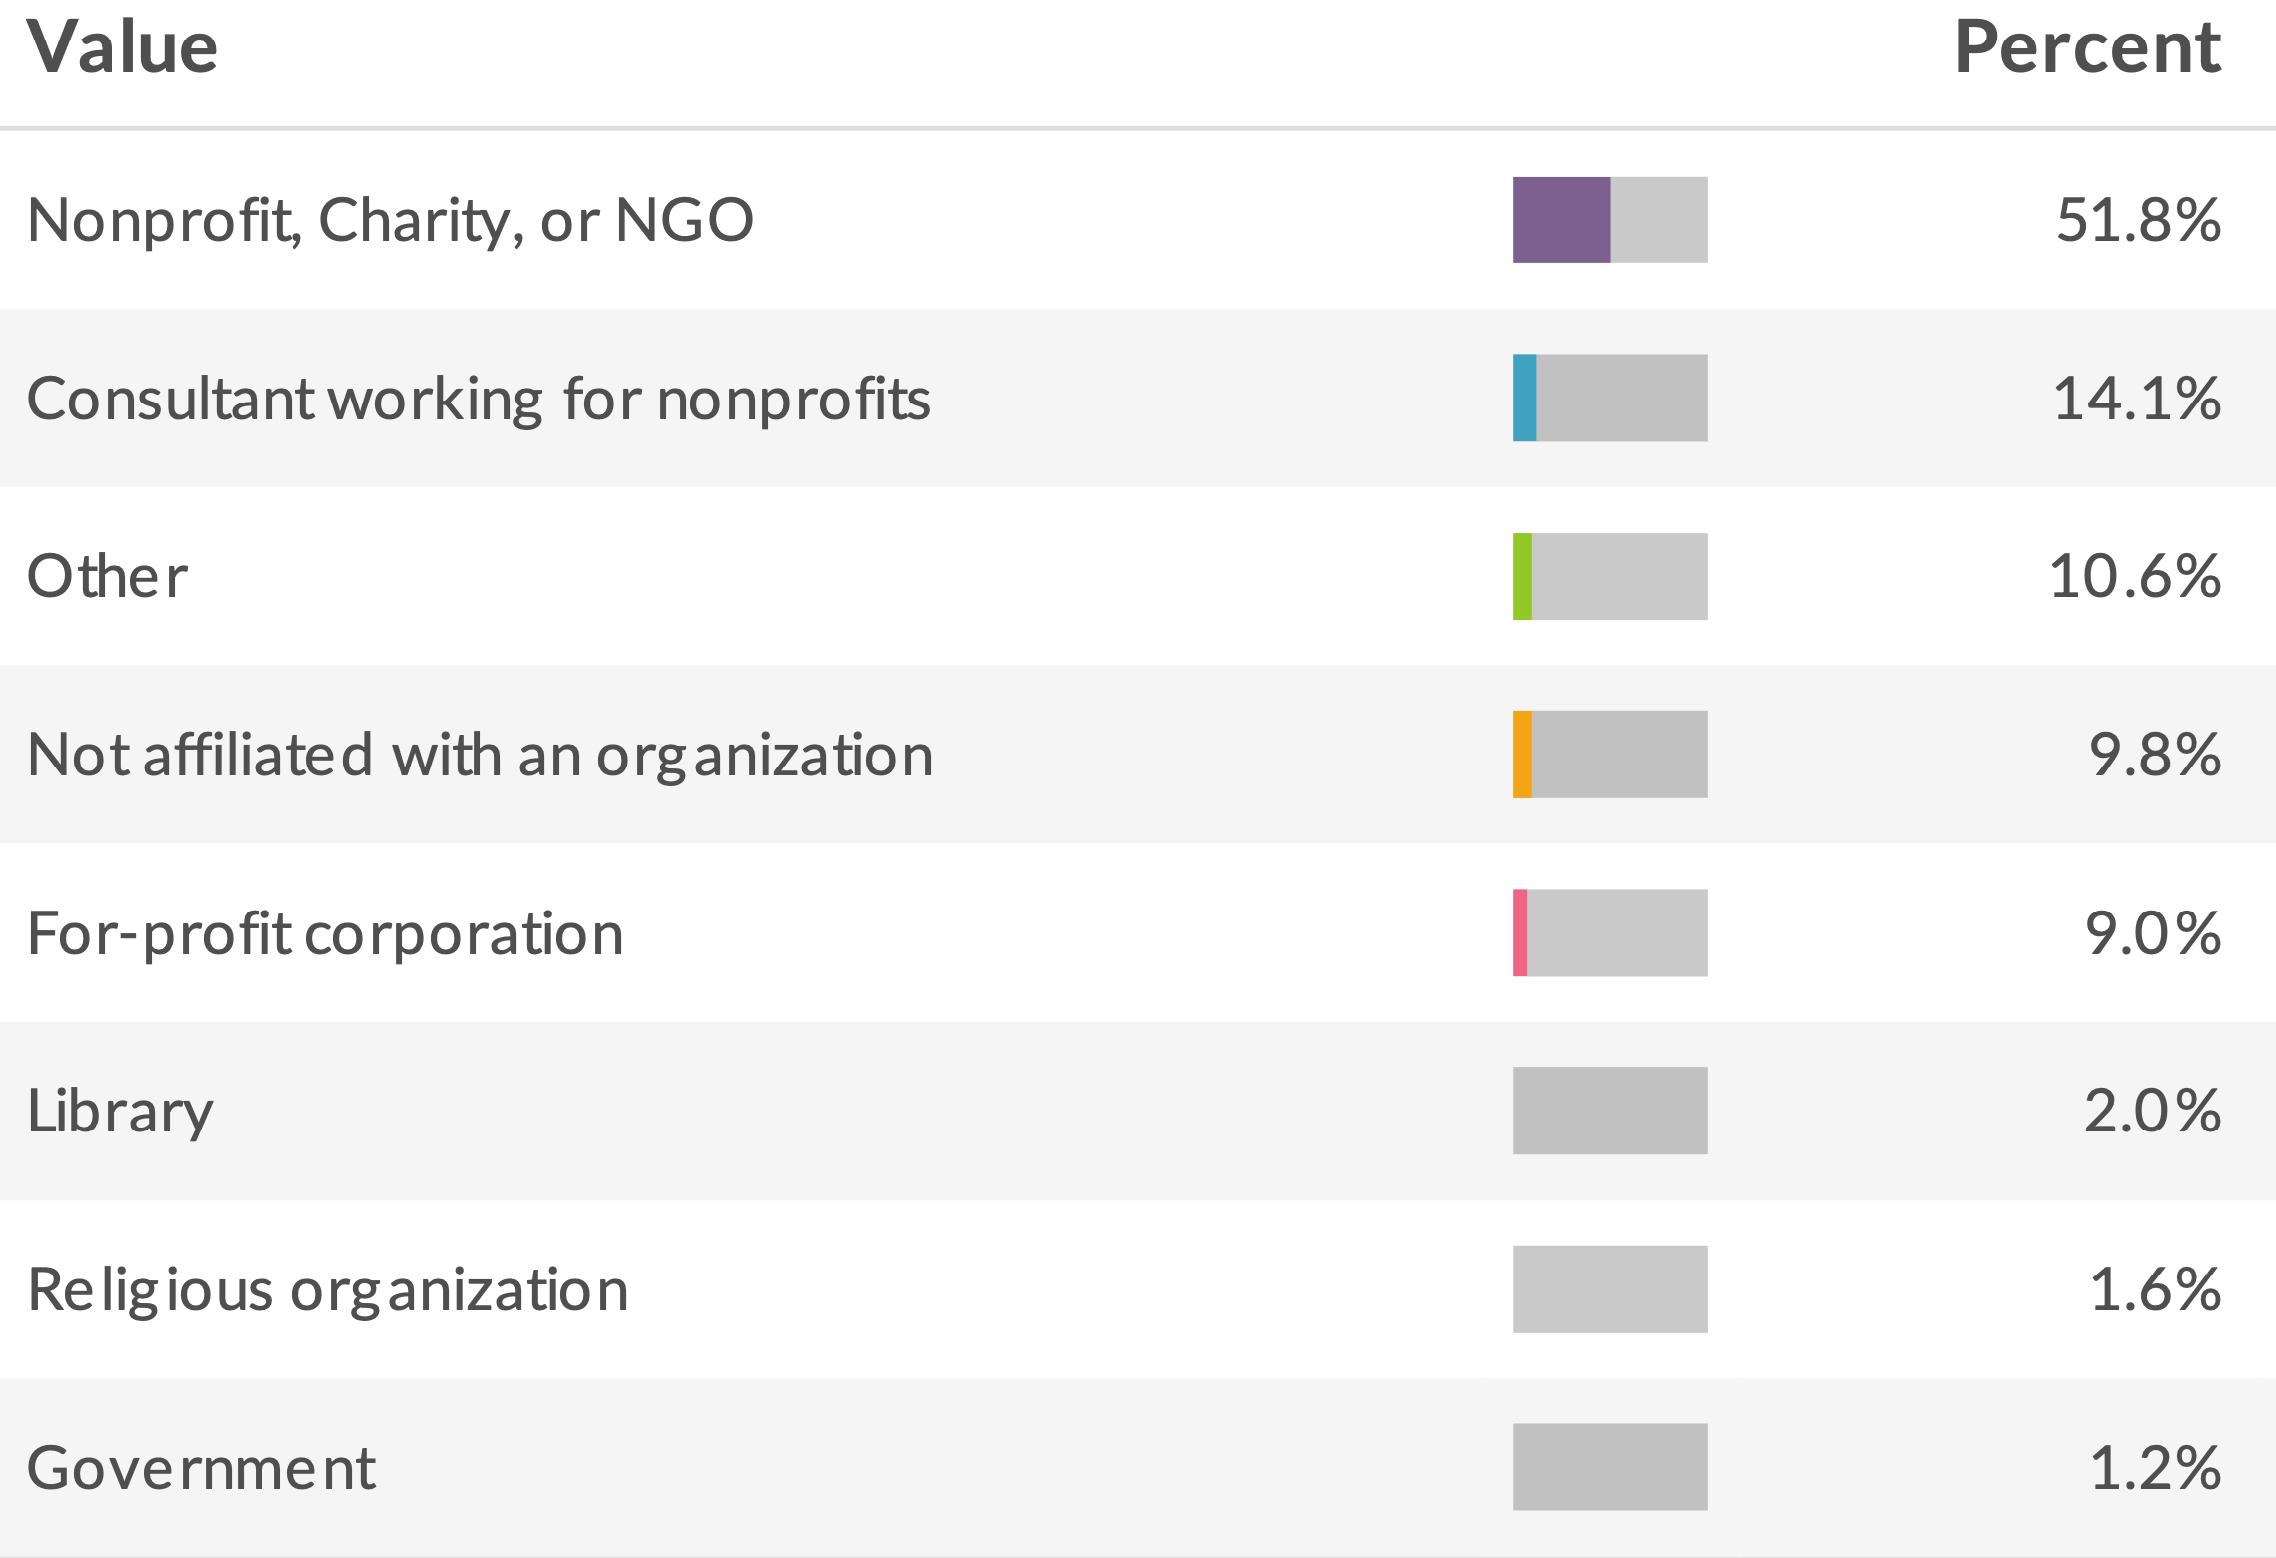 What Best Describes Your Organization?